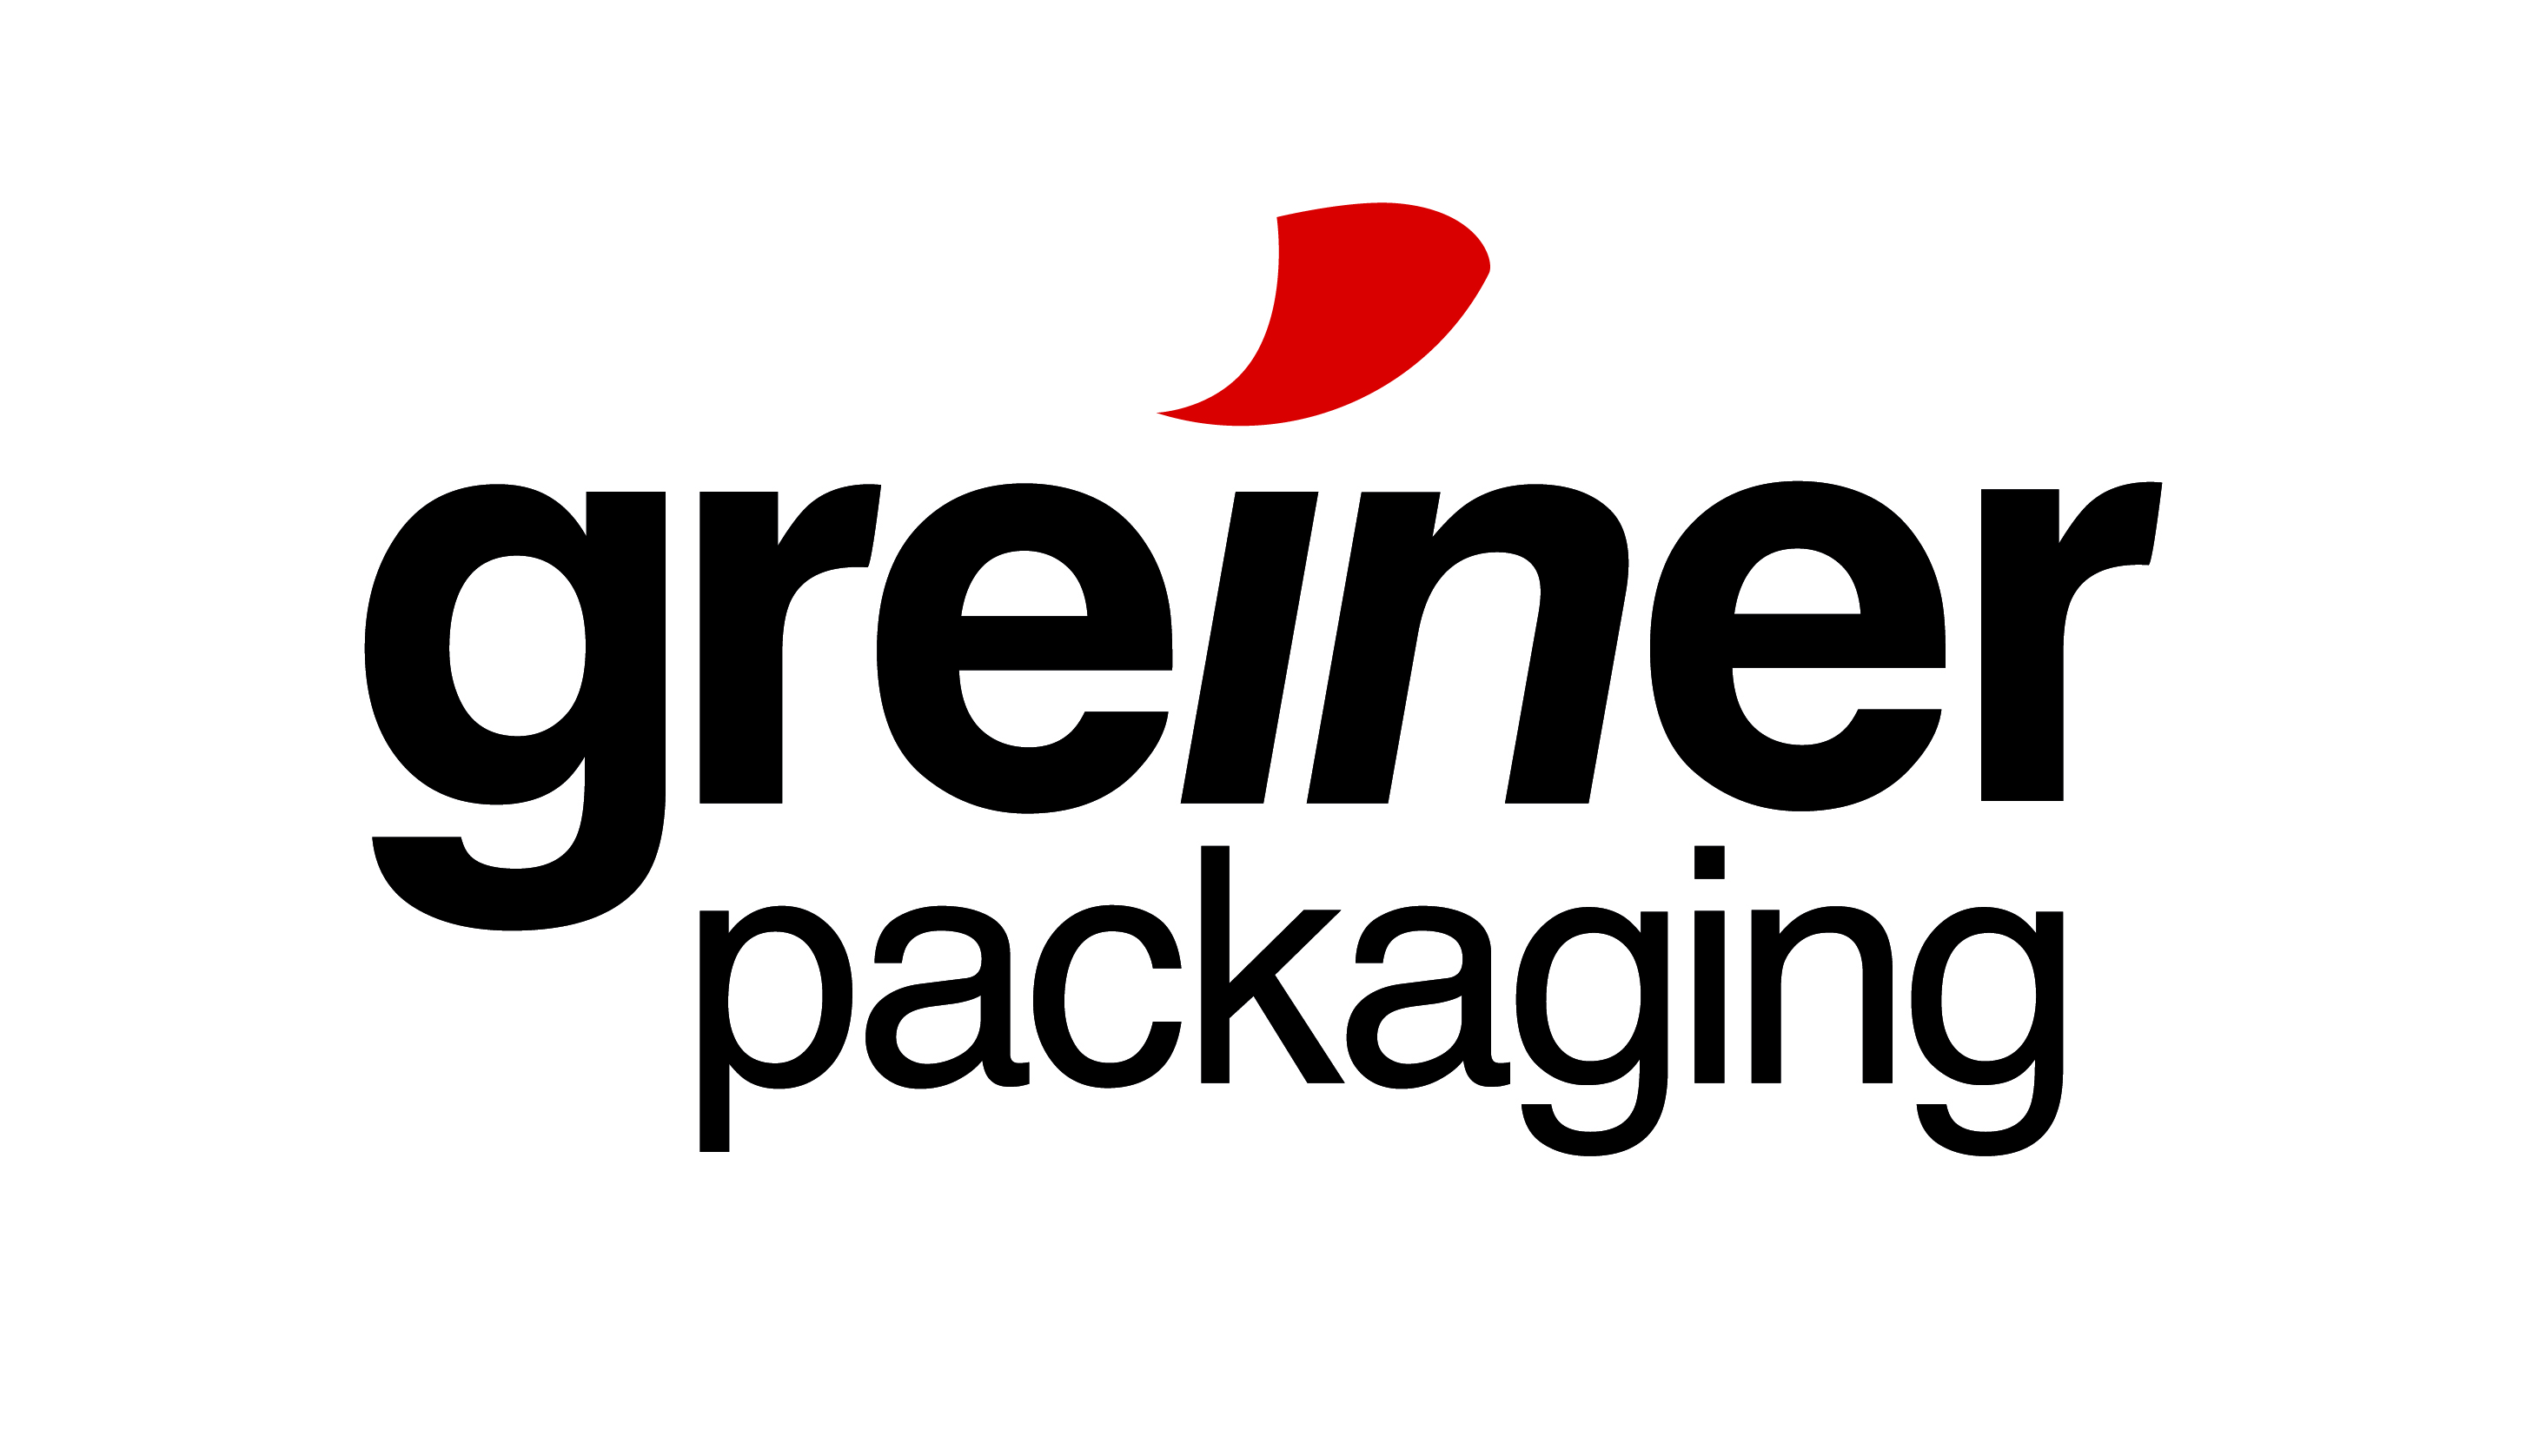 greiner packaging slušovice s.r.o.